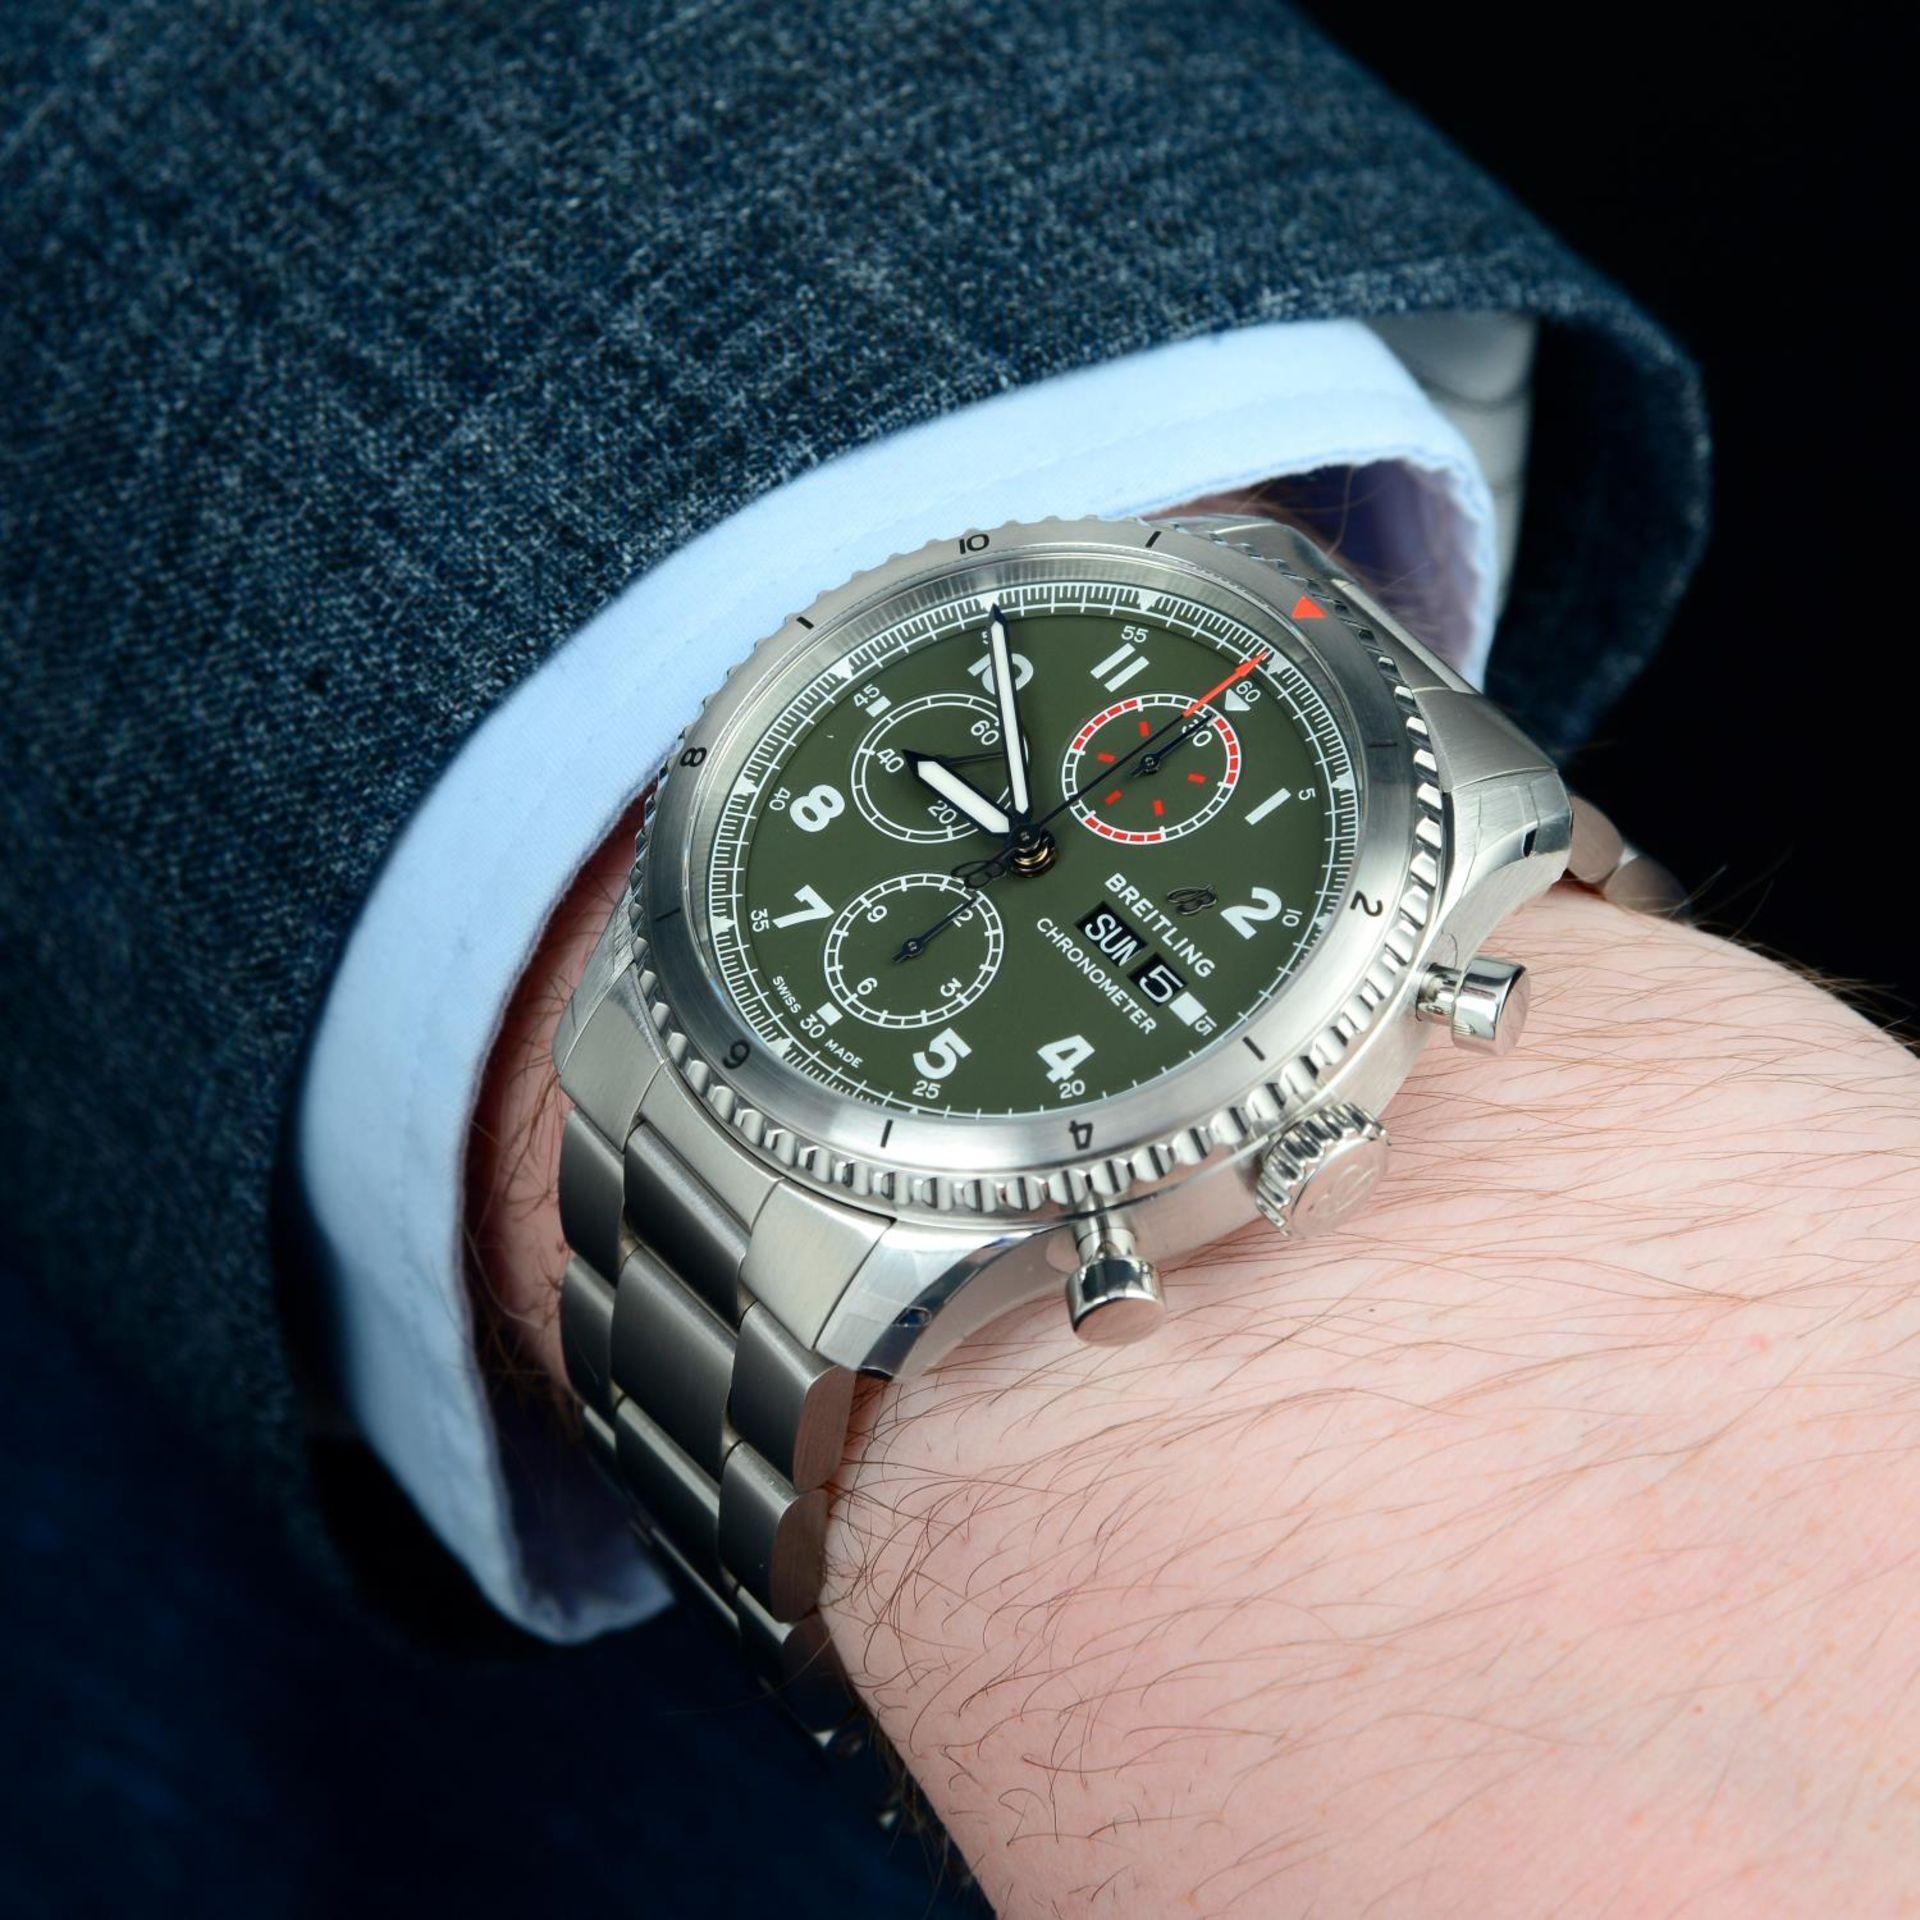 CURRENT MODEL: BREITLING - an Aviator 8 chronograph bracelet watch. - Bild 3 aus 6